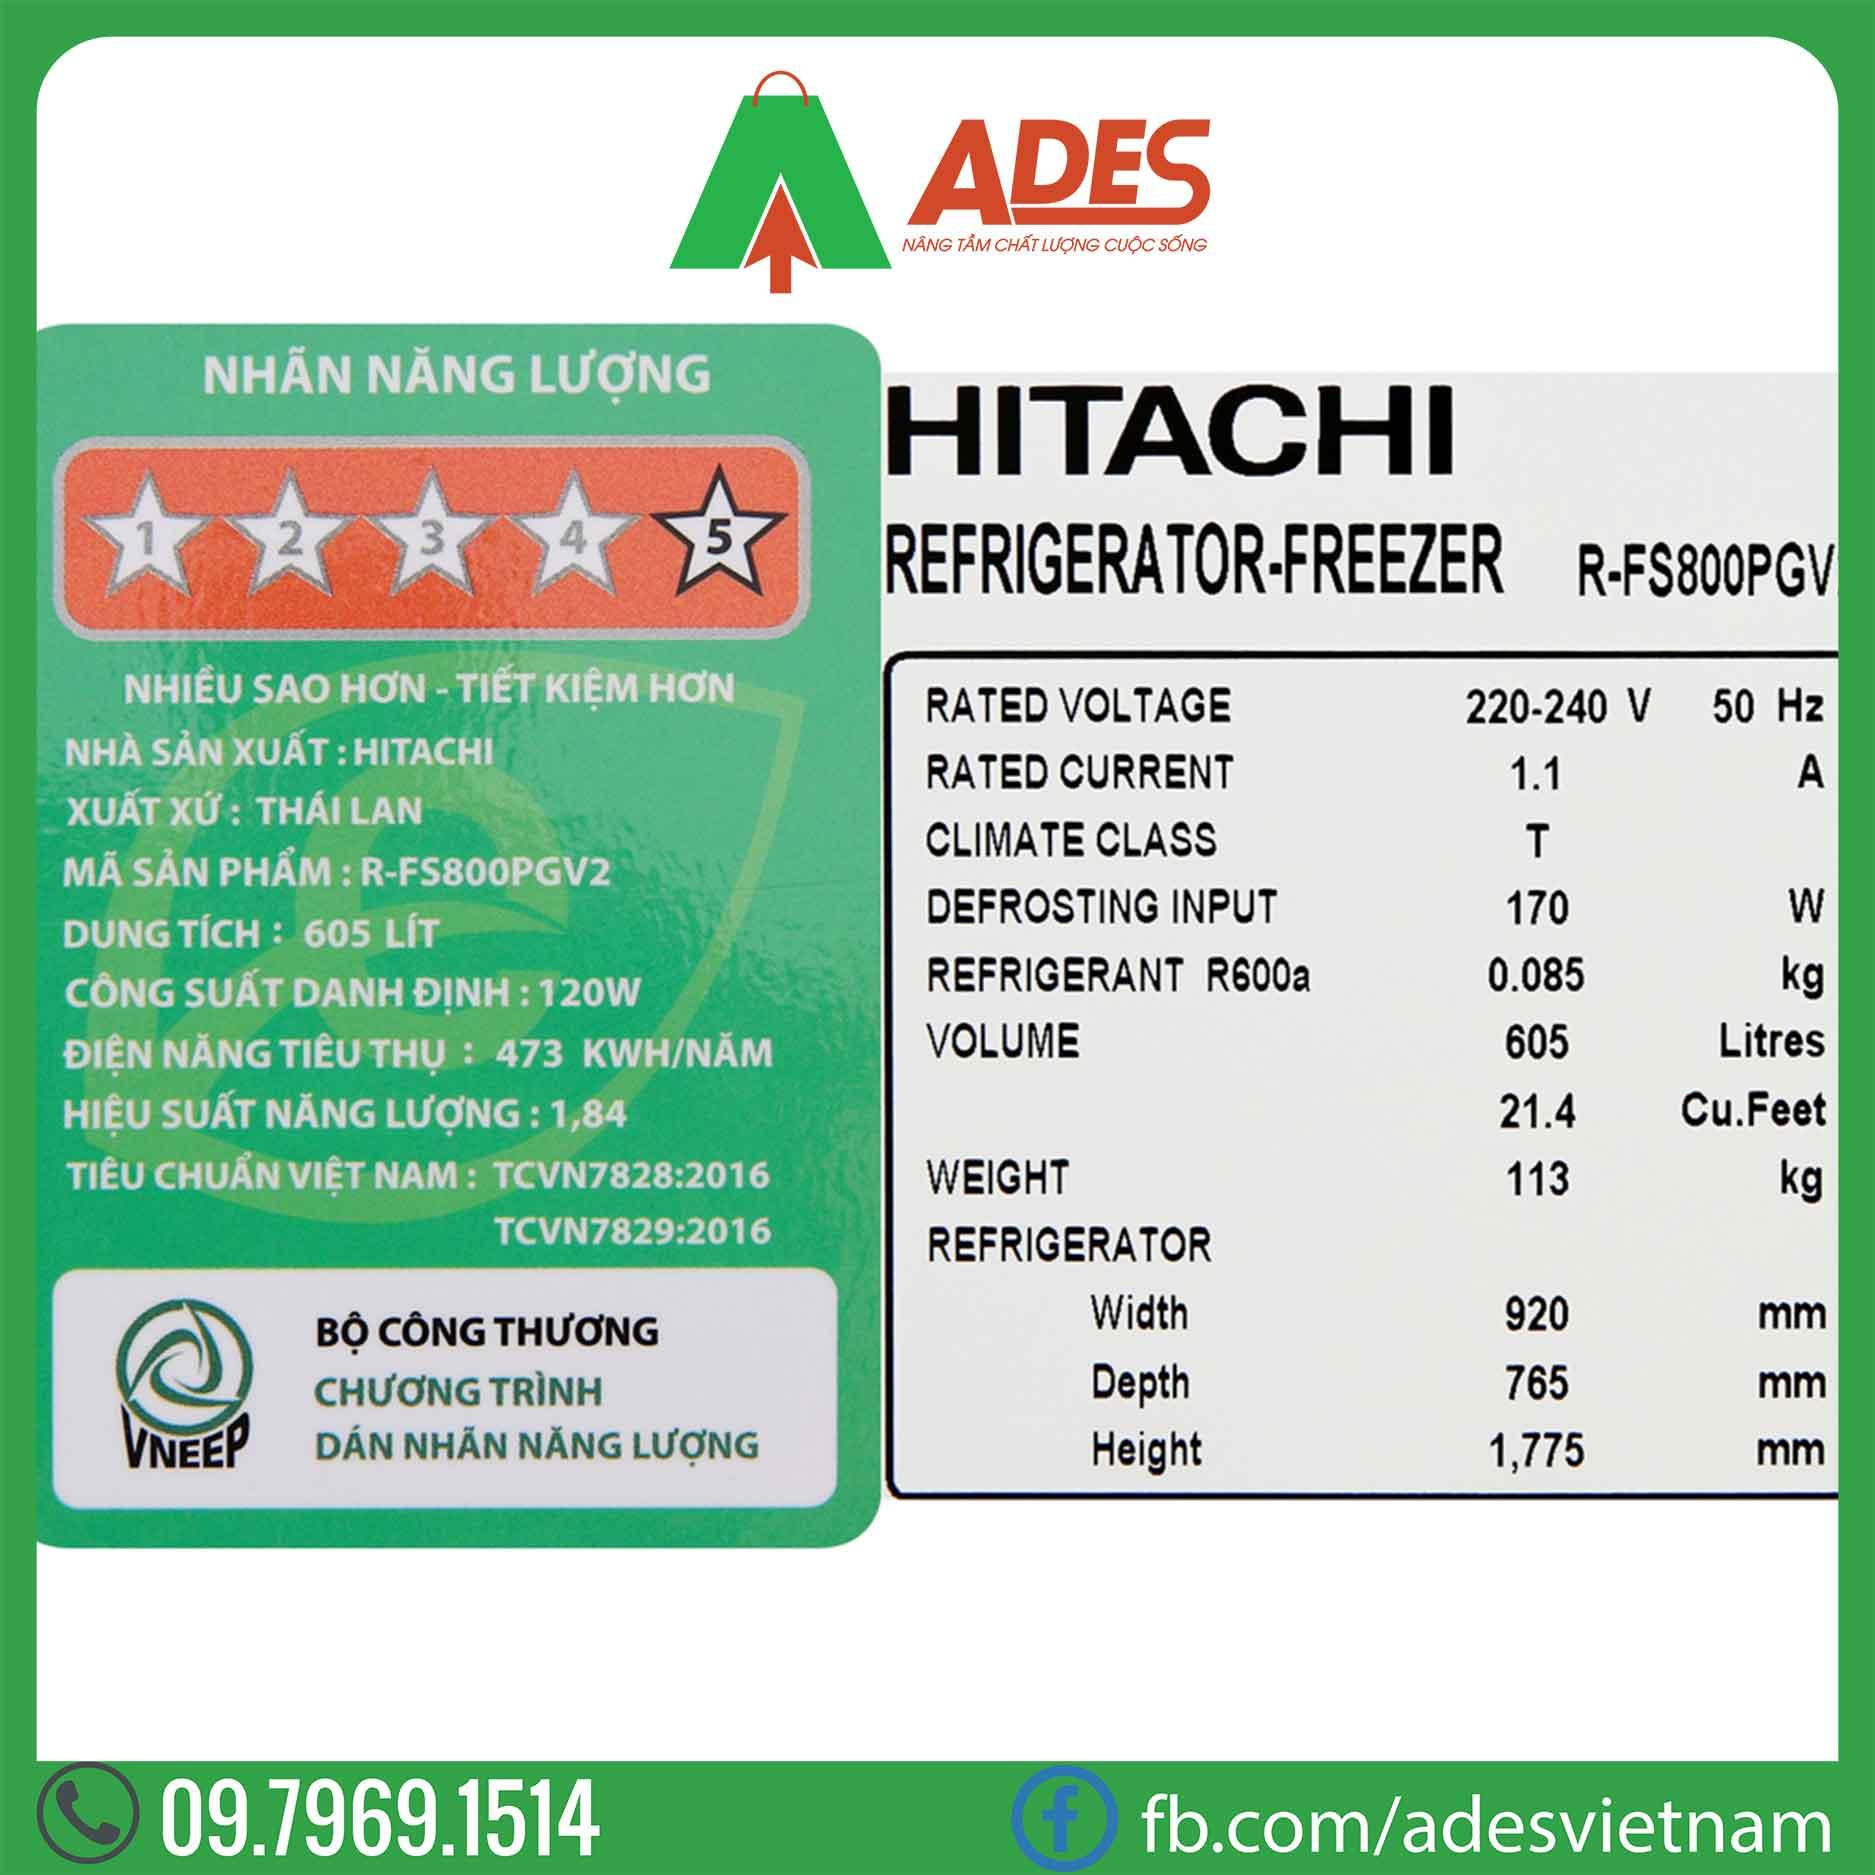 Tu lanh Hitachi Inverter F-S800PGV2 GBK